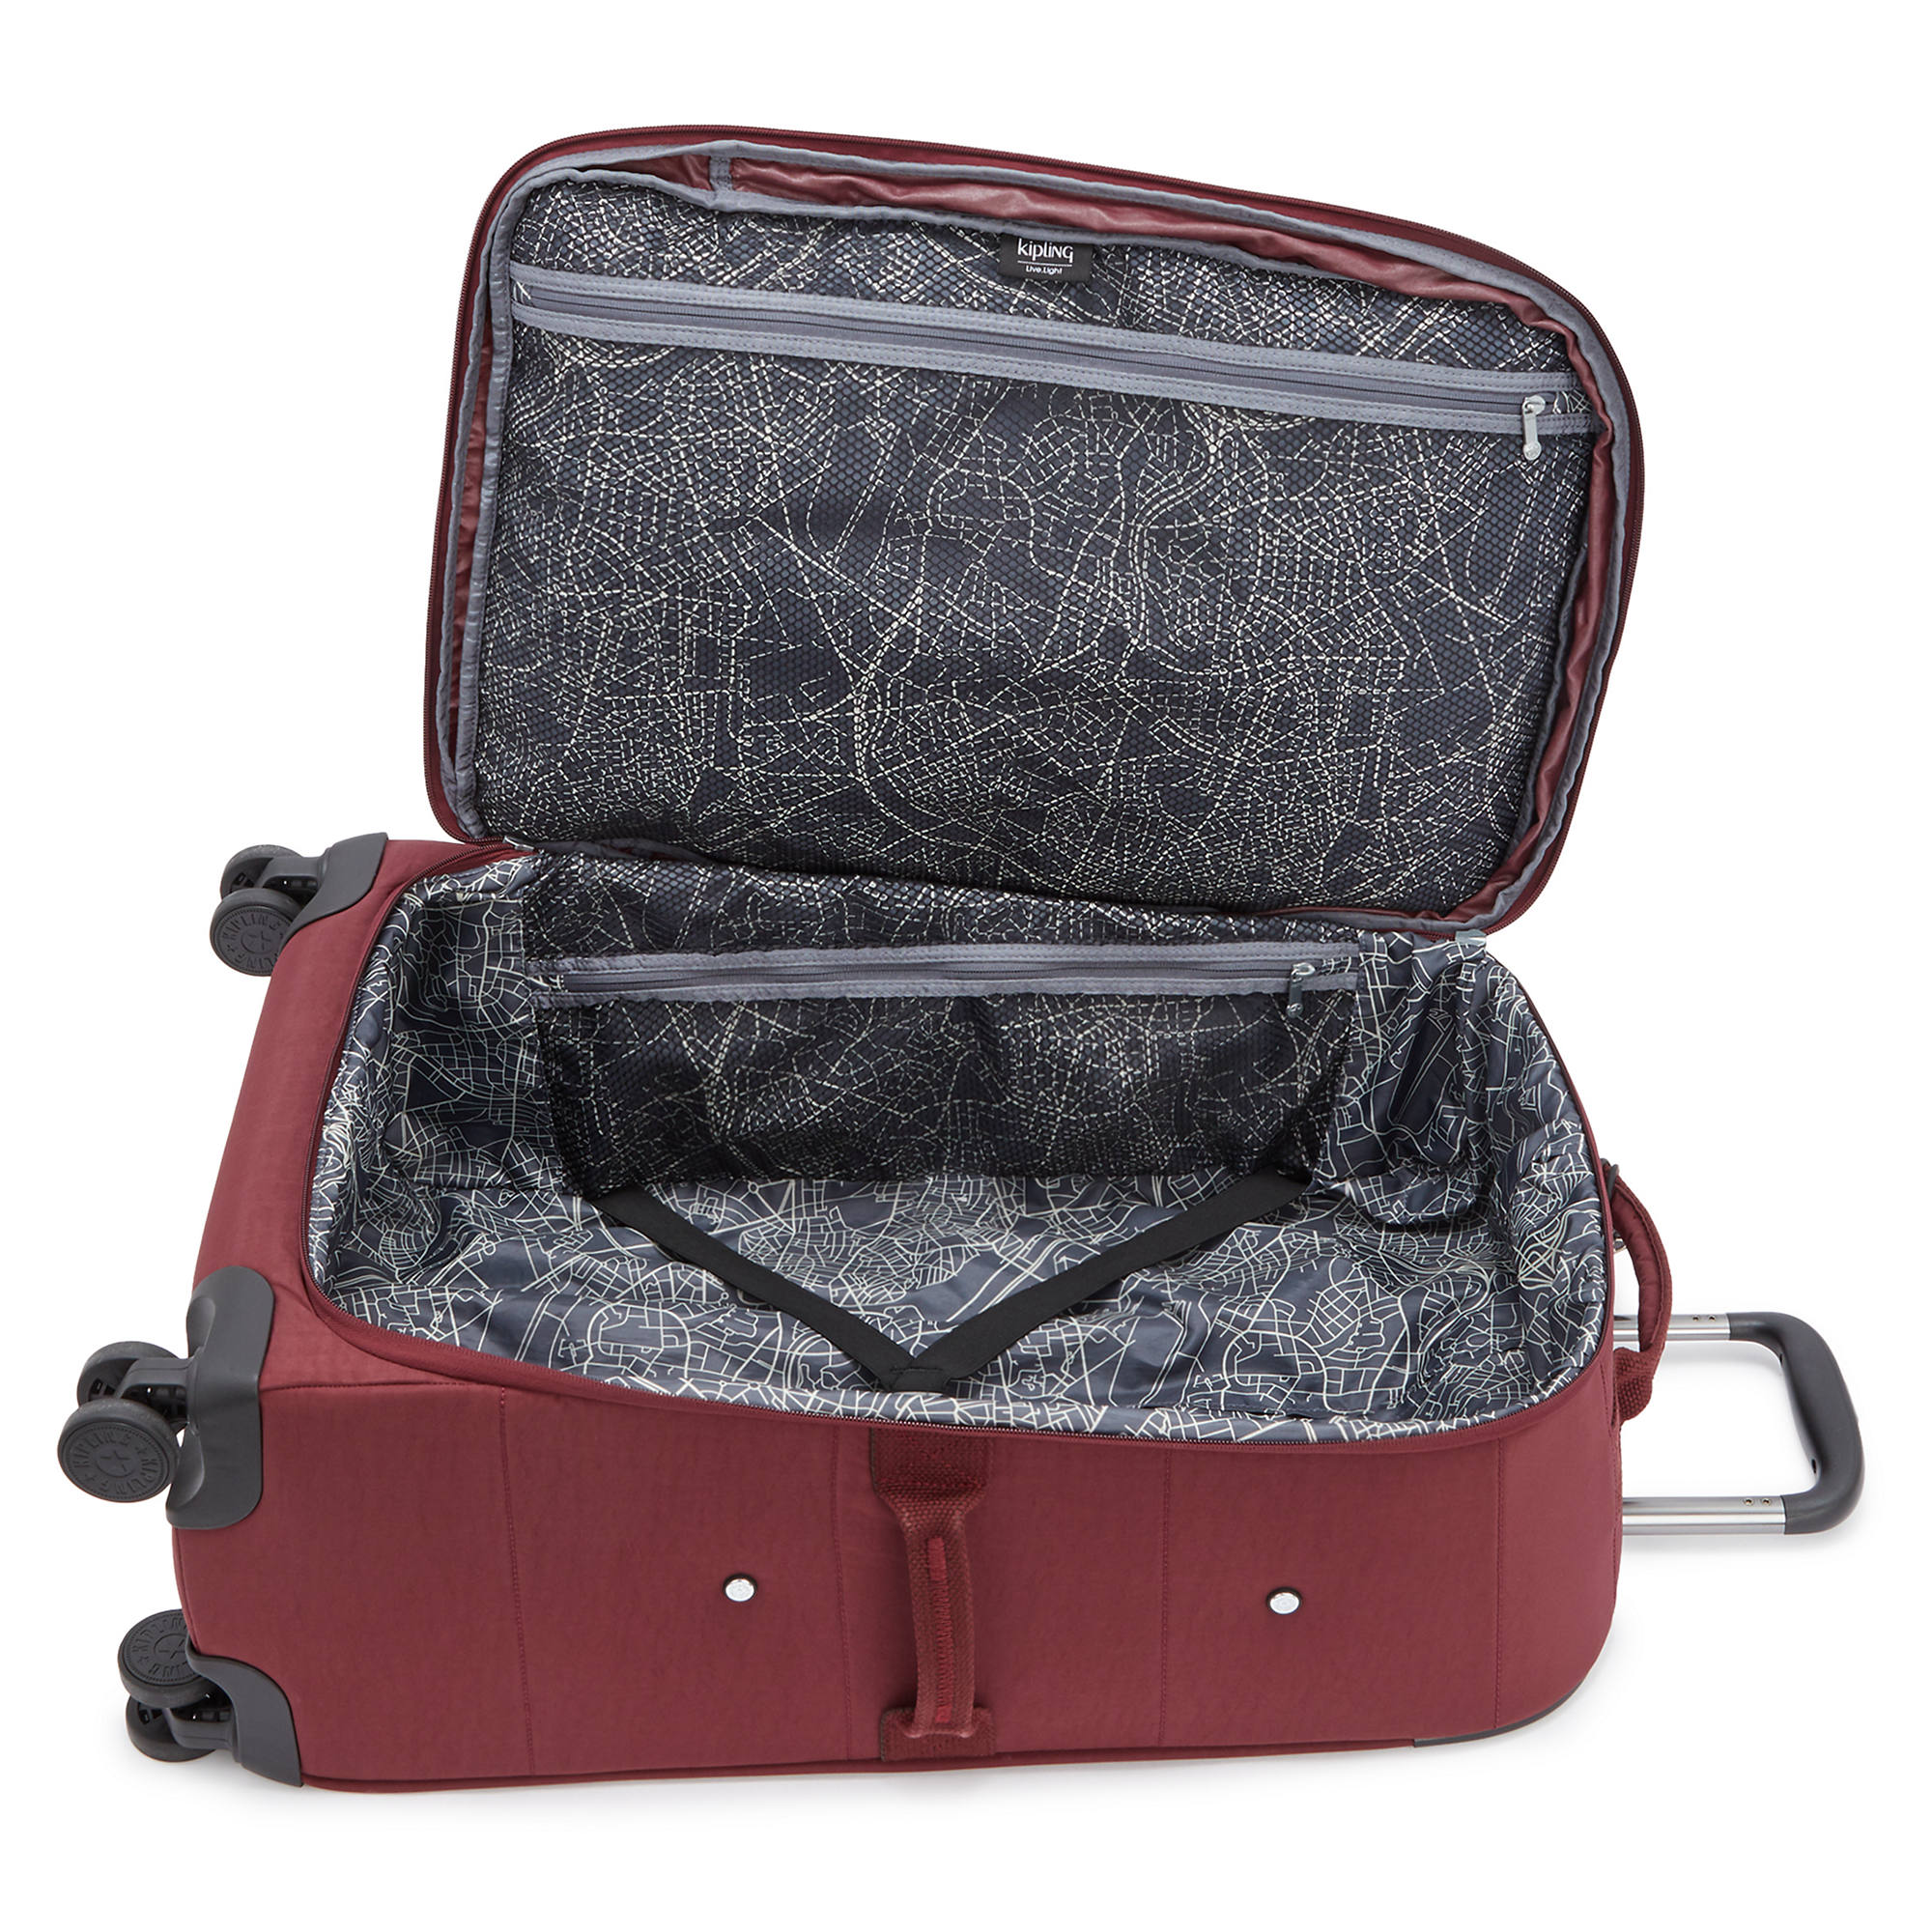 thumbnail 15 - Kipling City Spinner Medium Rolling Luggage